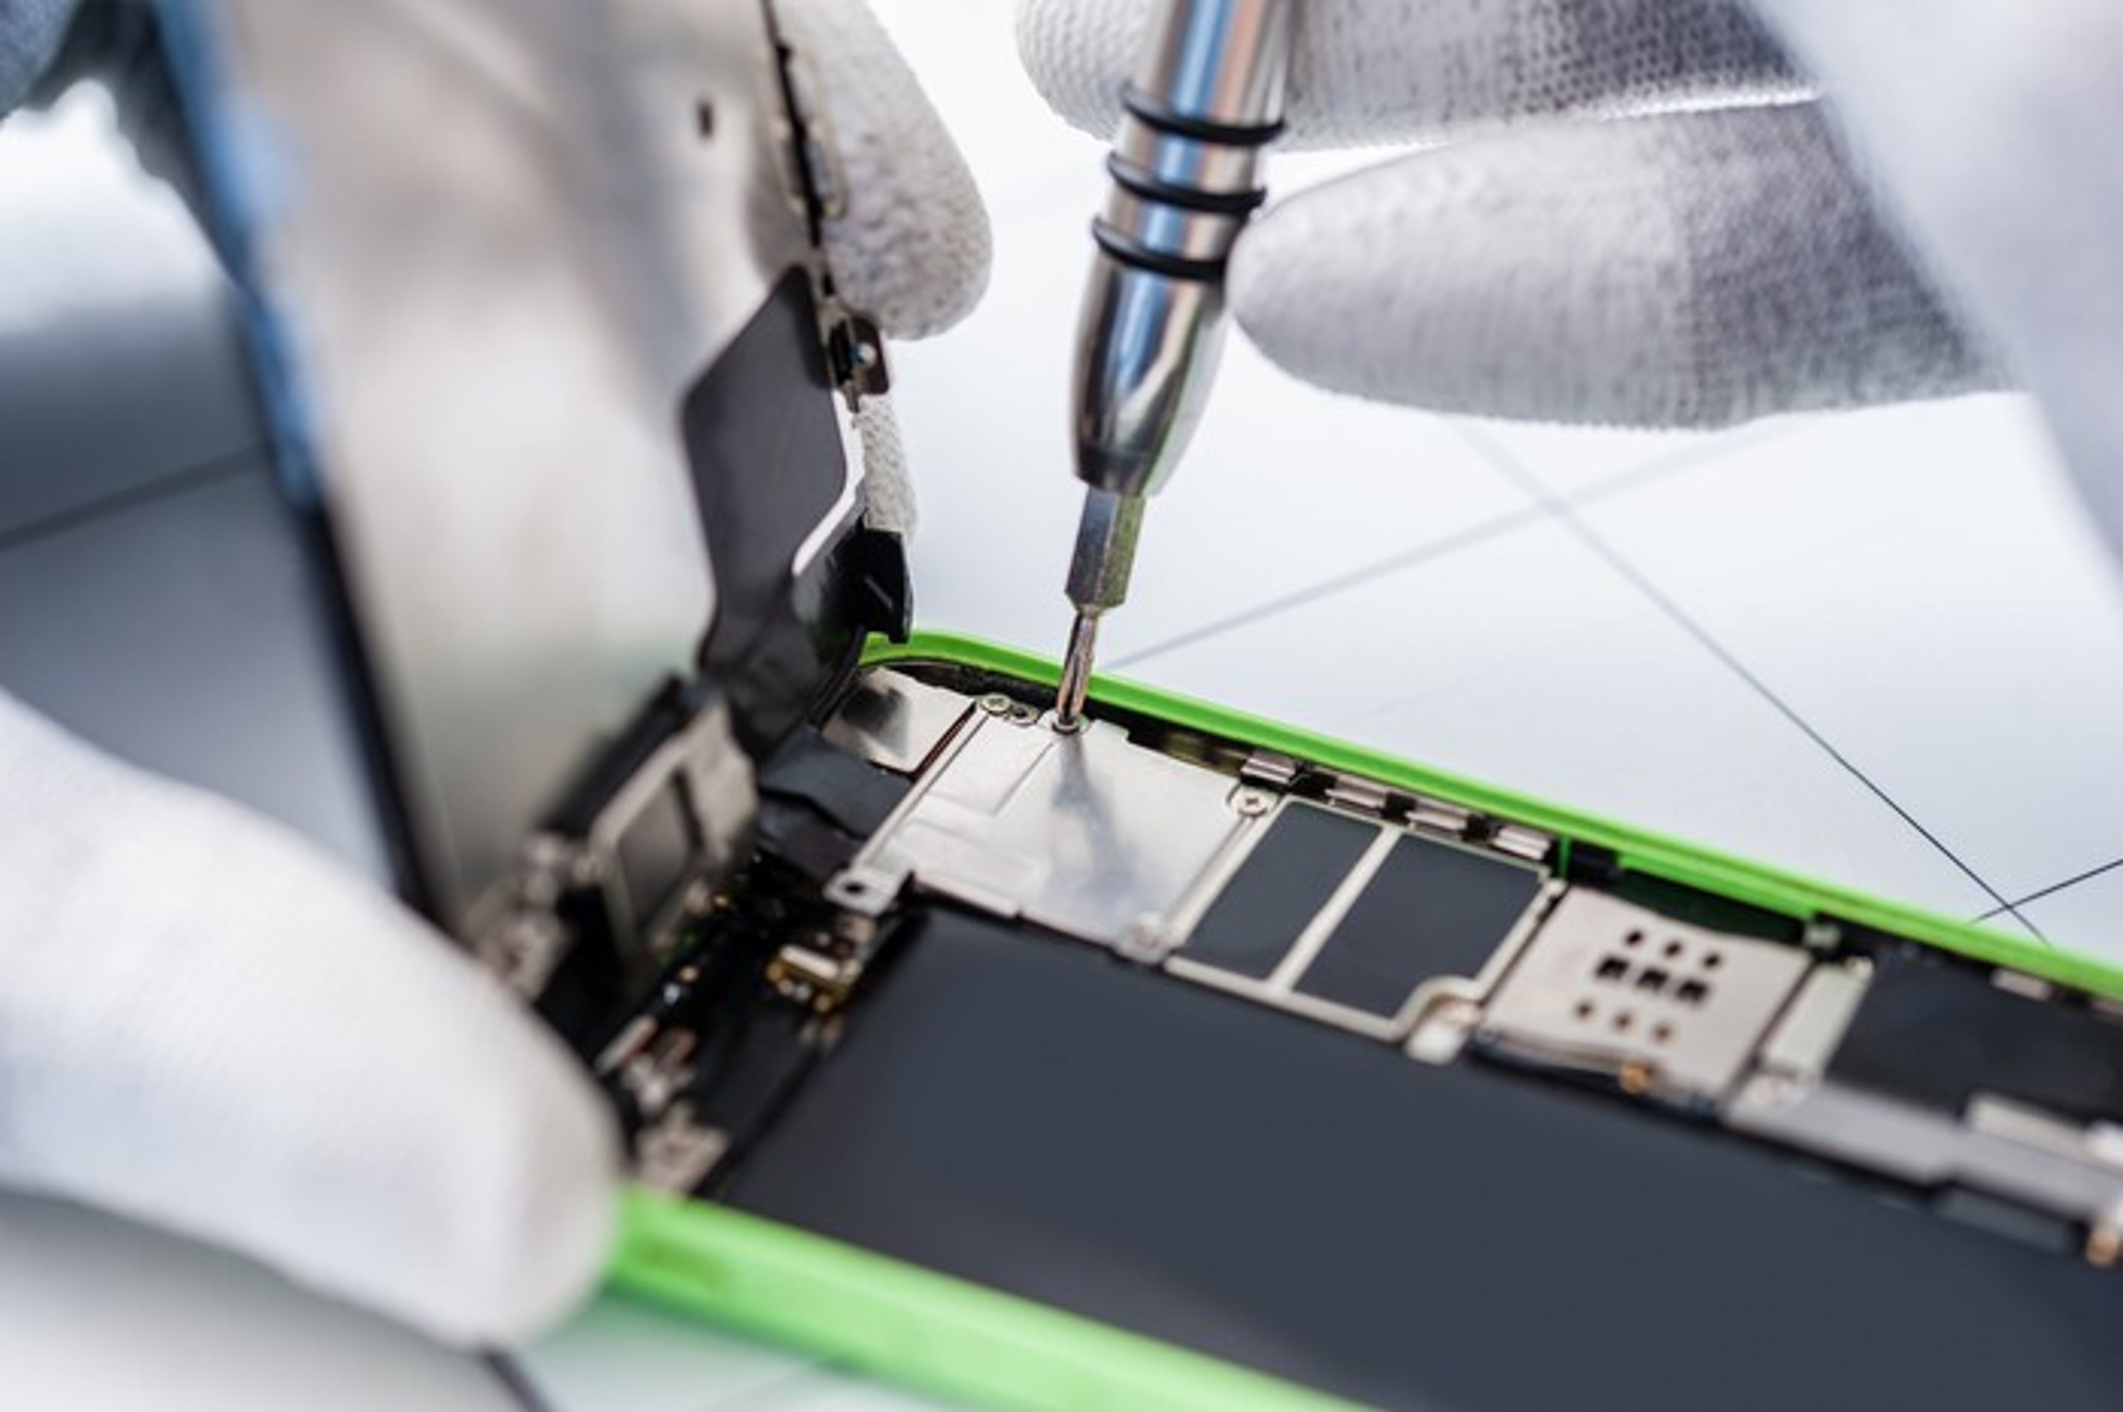 Repairing a cell phone.